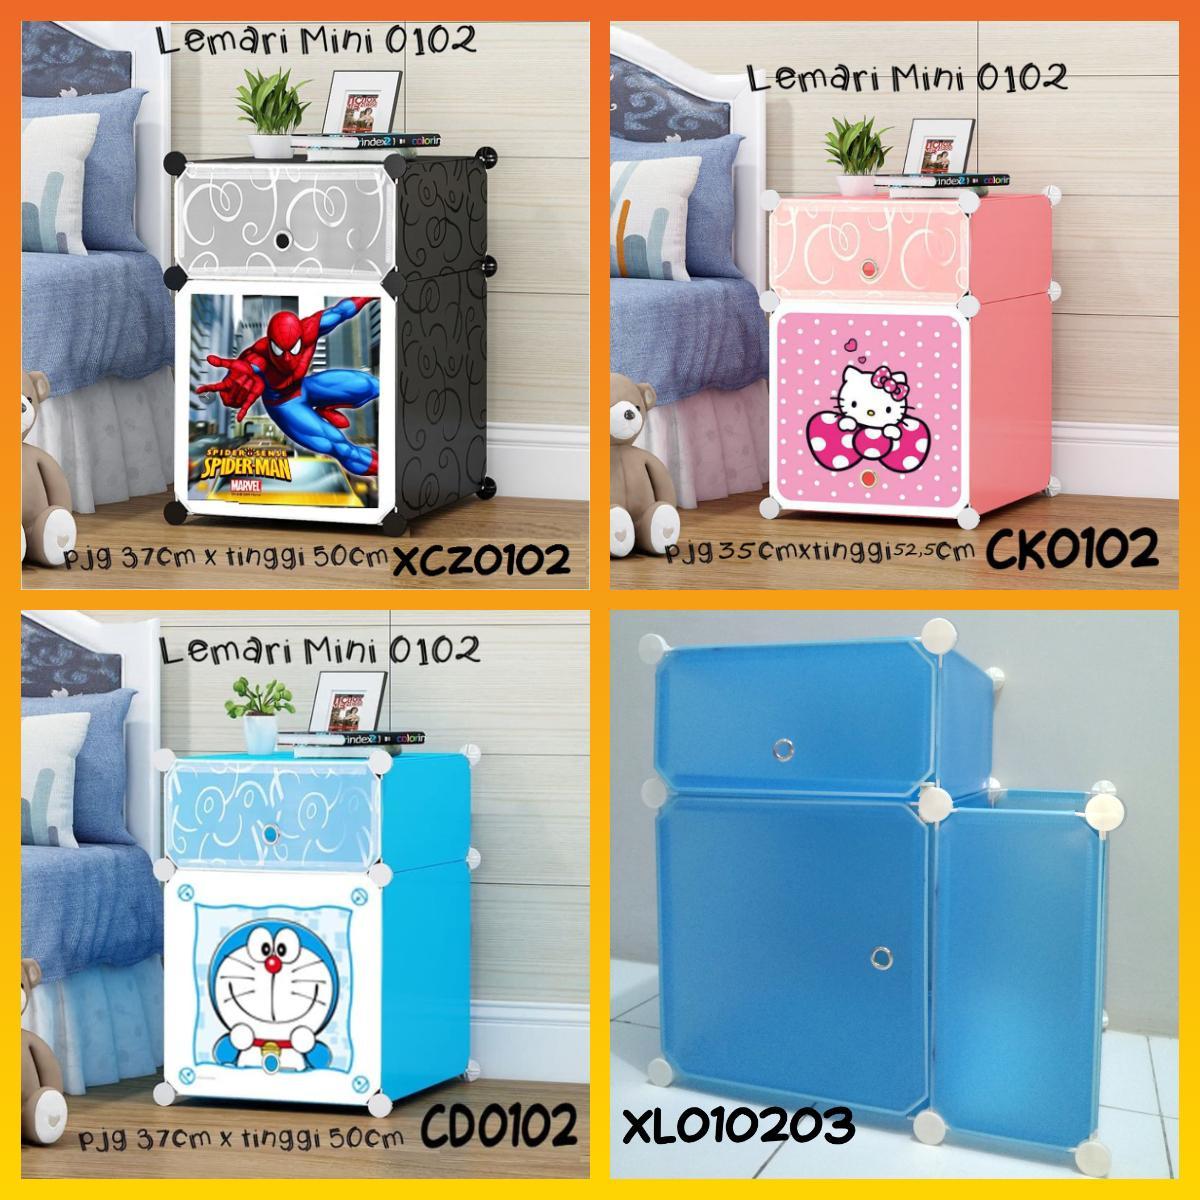 Worldhome - Lemari Sisi Ranjang Plastik/lemari Pakaian Portable/lemari Serba Guna Hard Plastic By World Home.